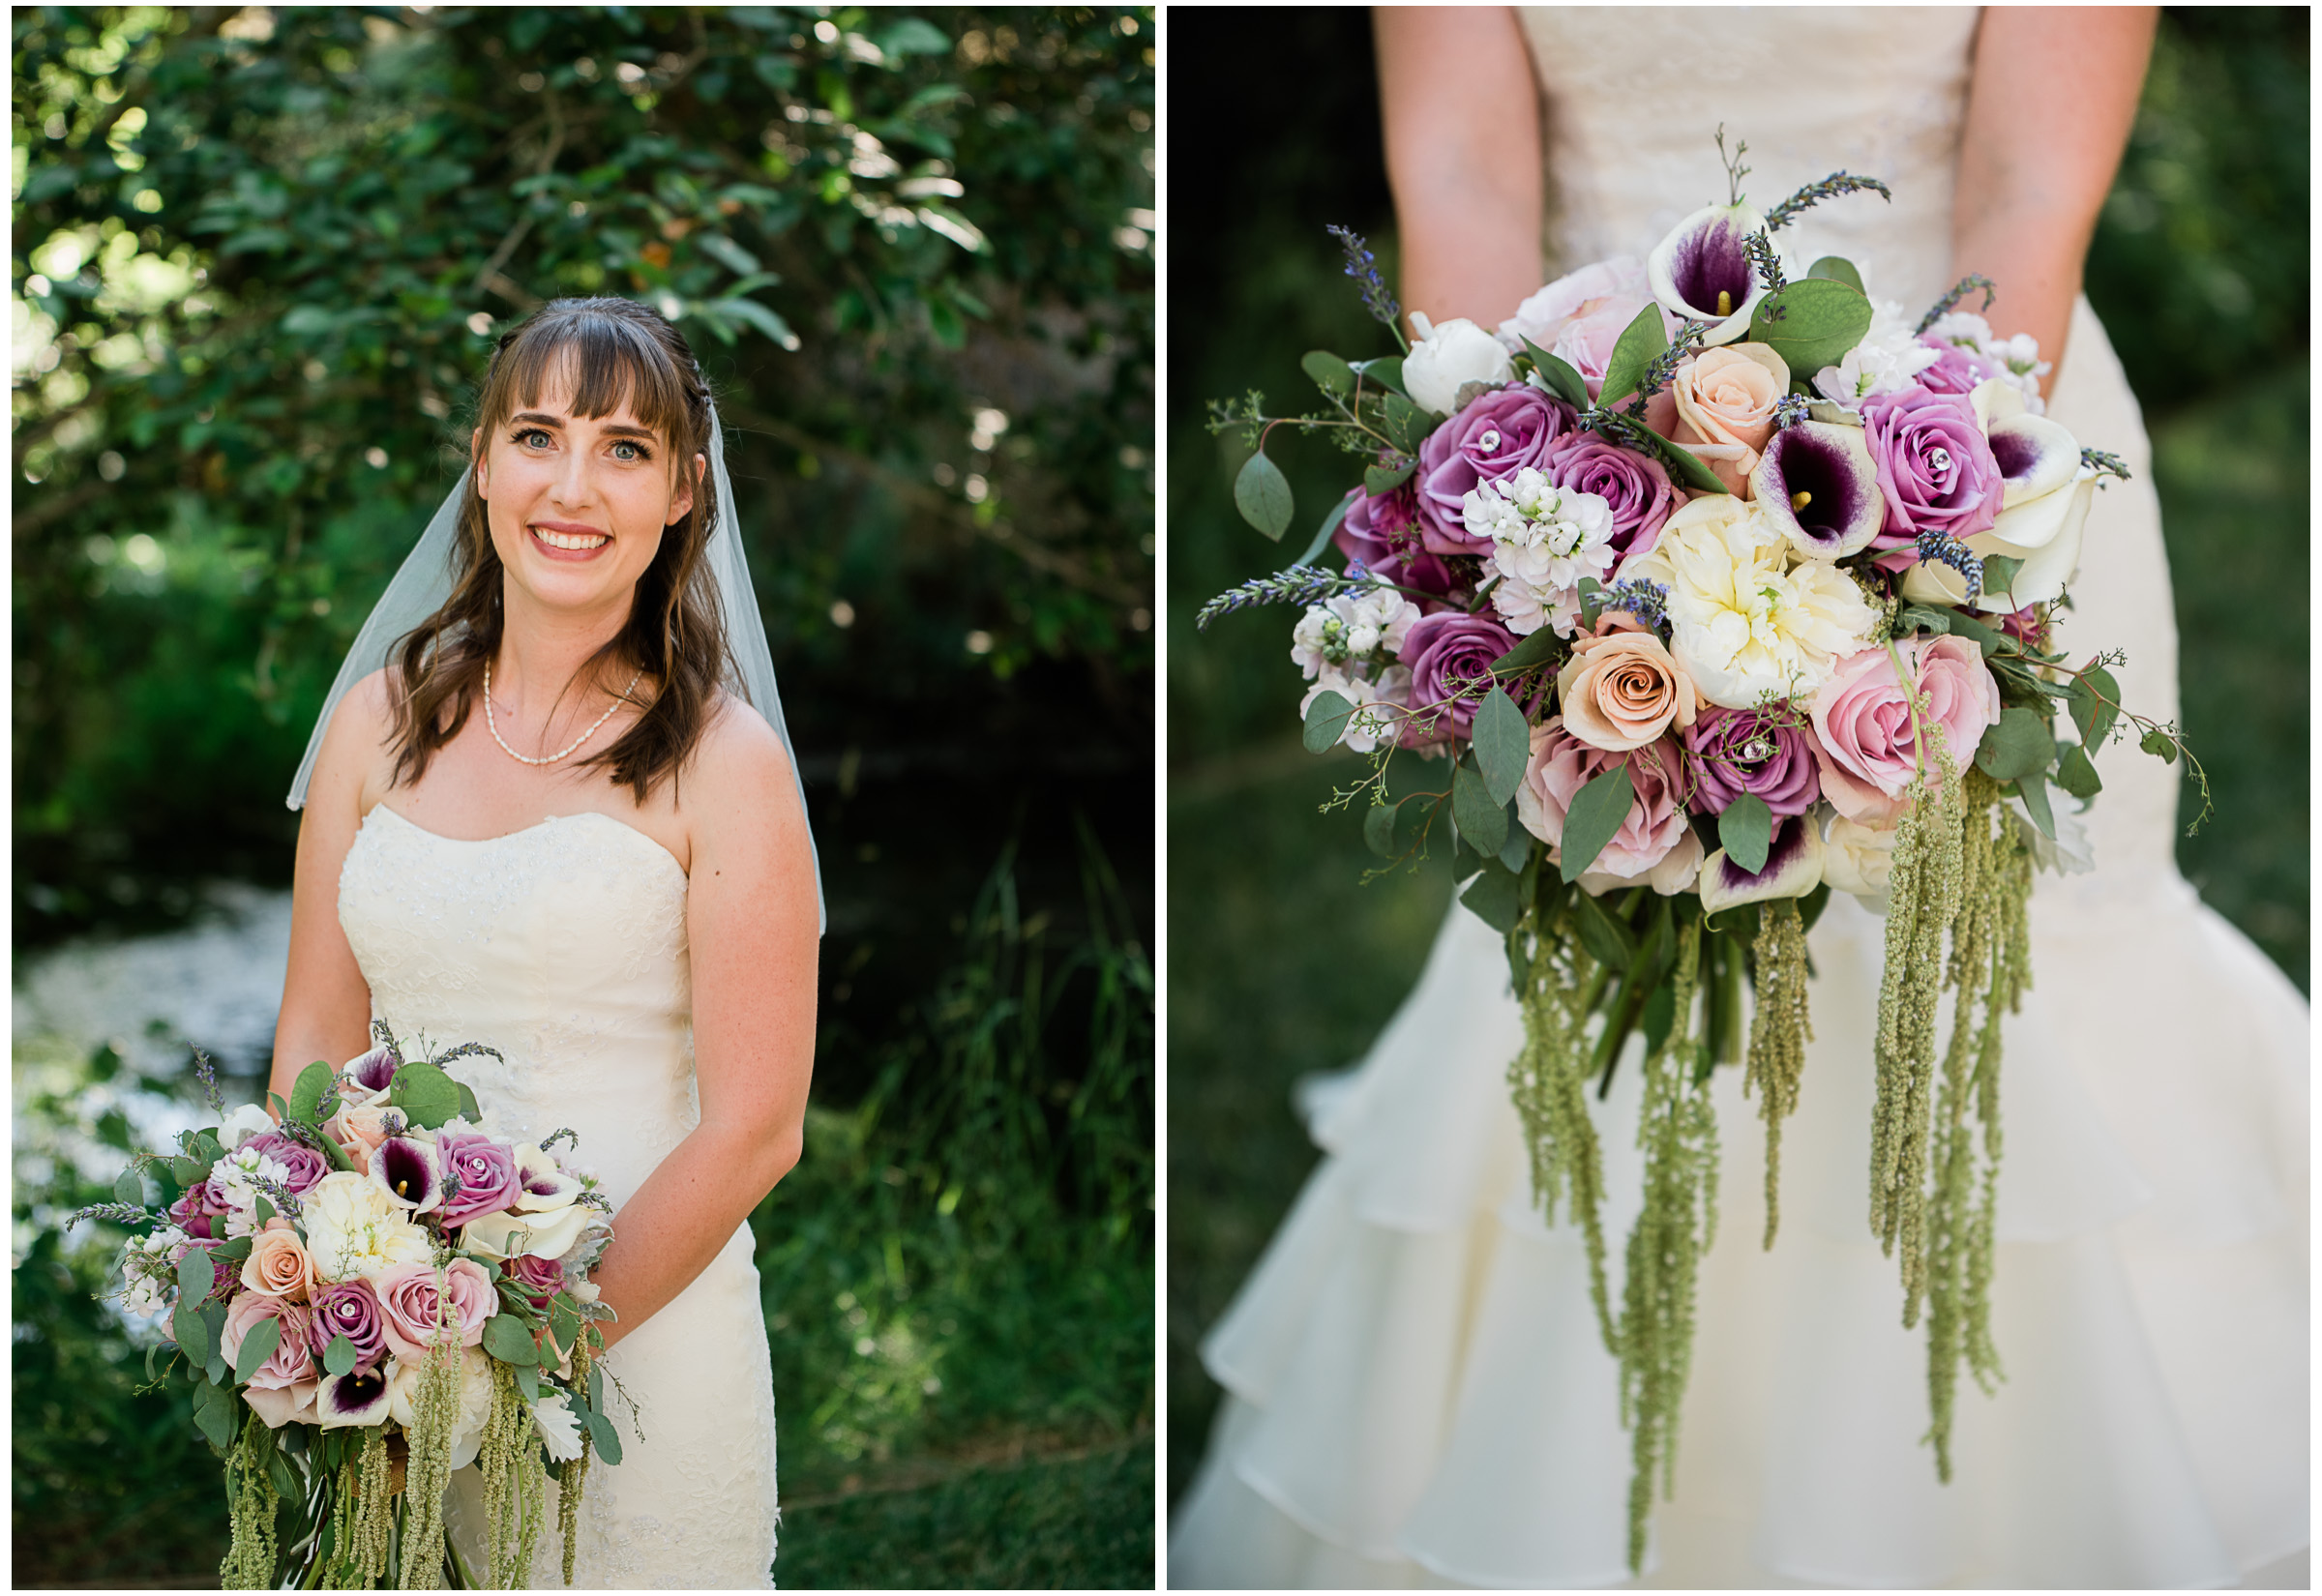 Placerville Wedding - Sacramento Photographer - Justin Wilcox Photography - 13.jpg